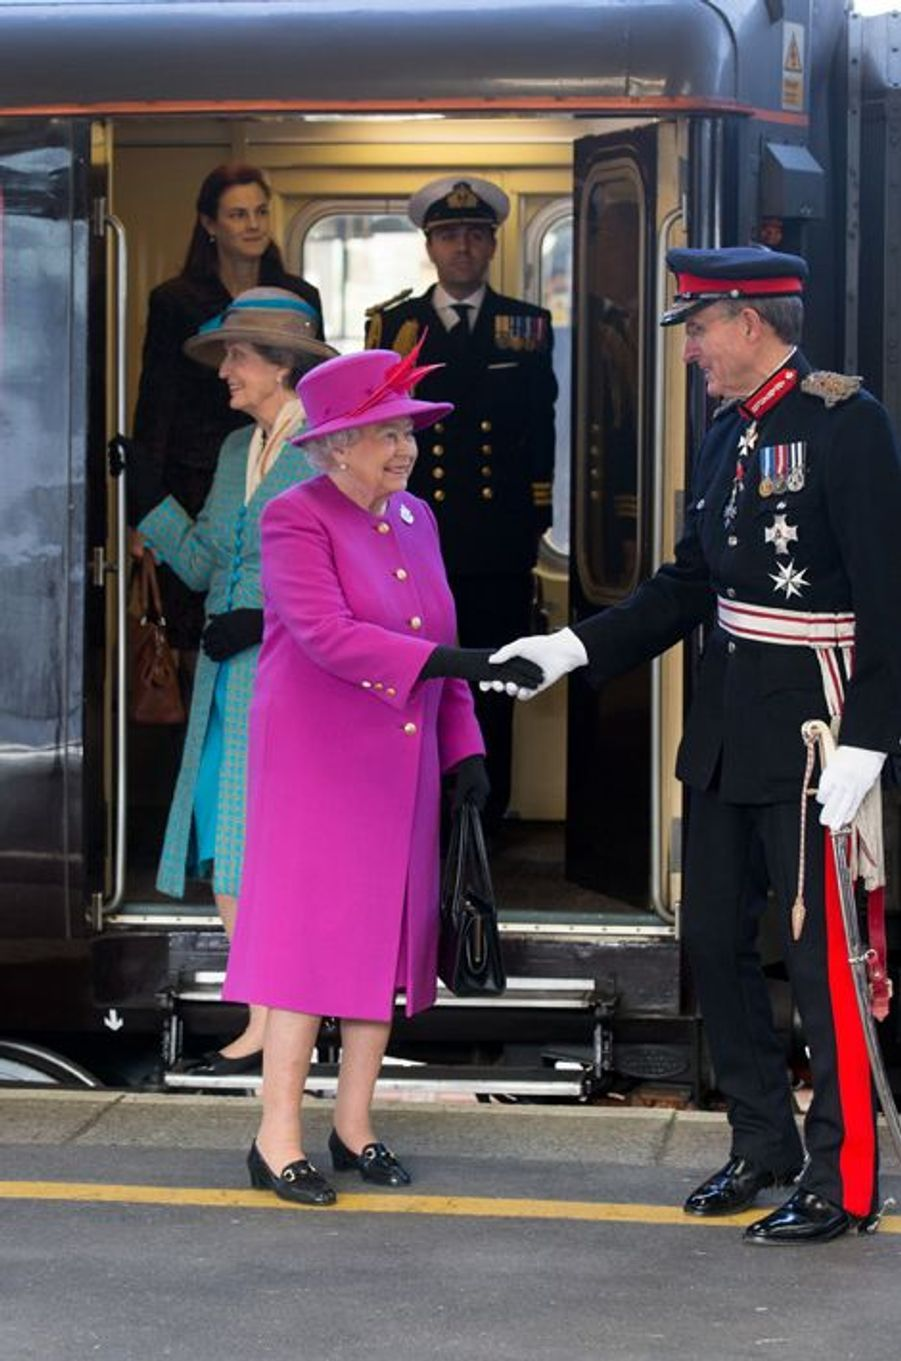 La reine Elizabeth II arrive en train à la gare de Plymouth, le 20 mars 2015